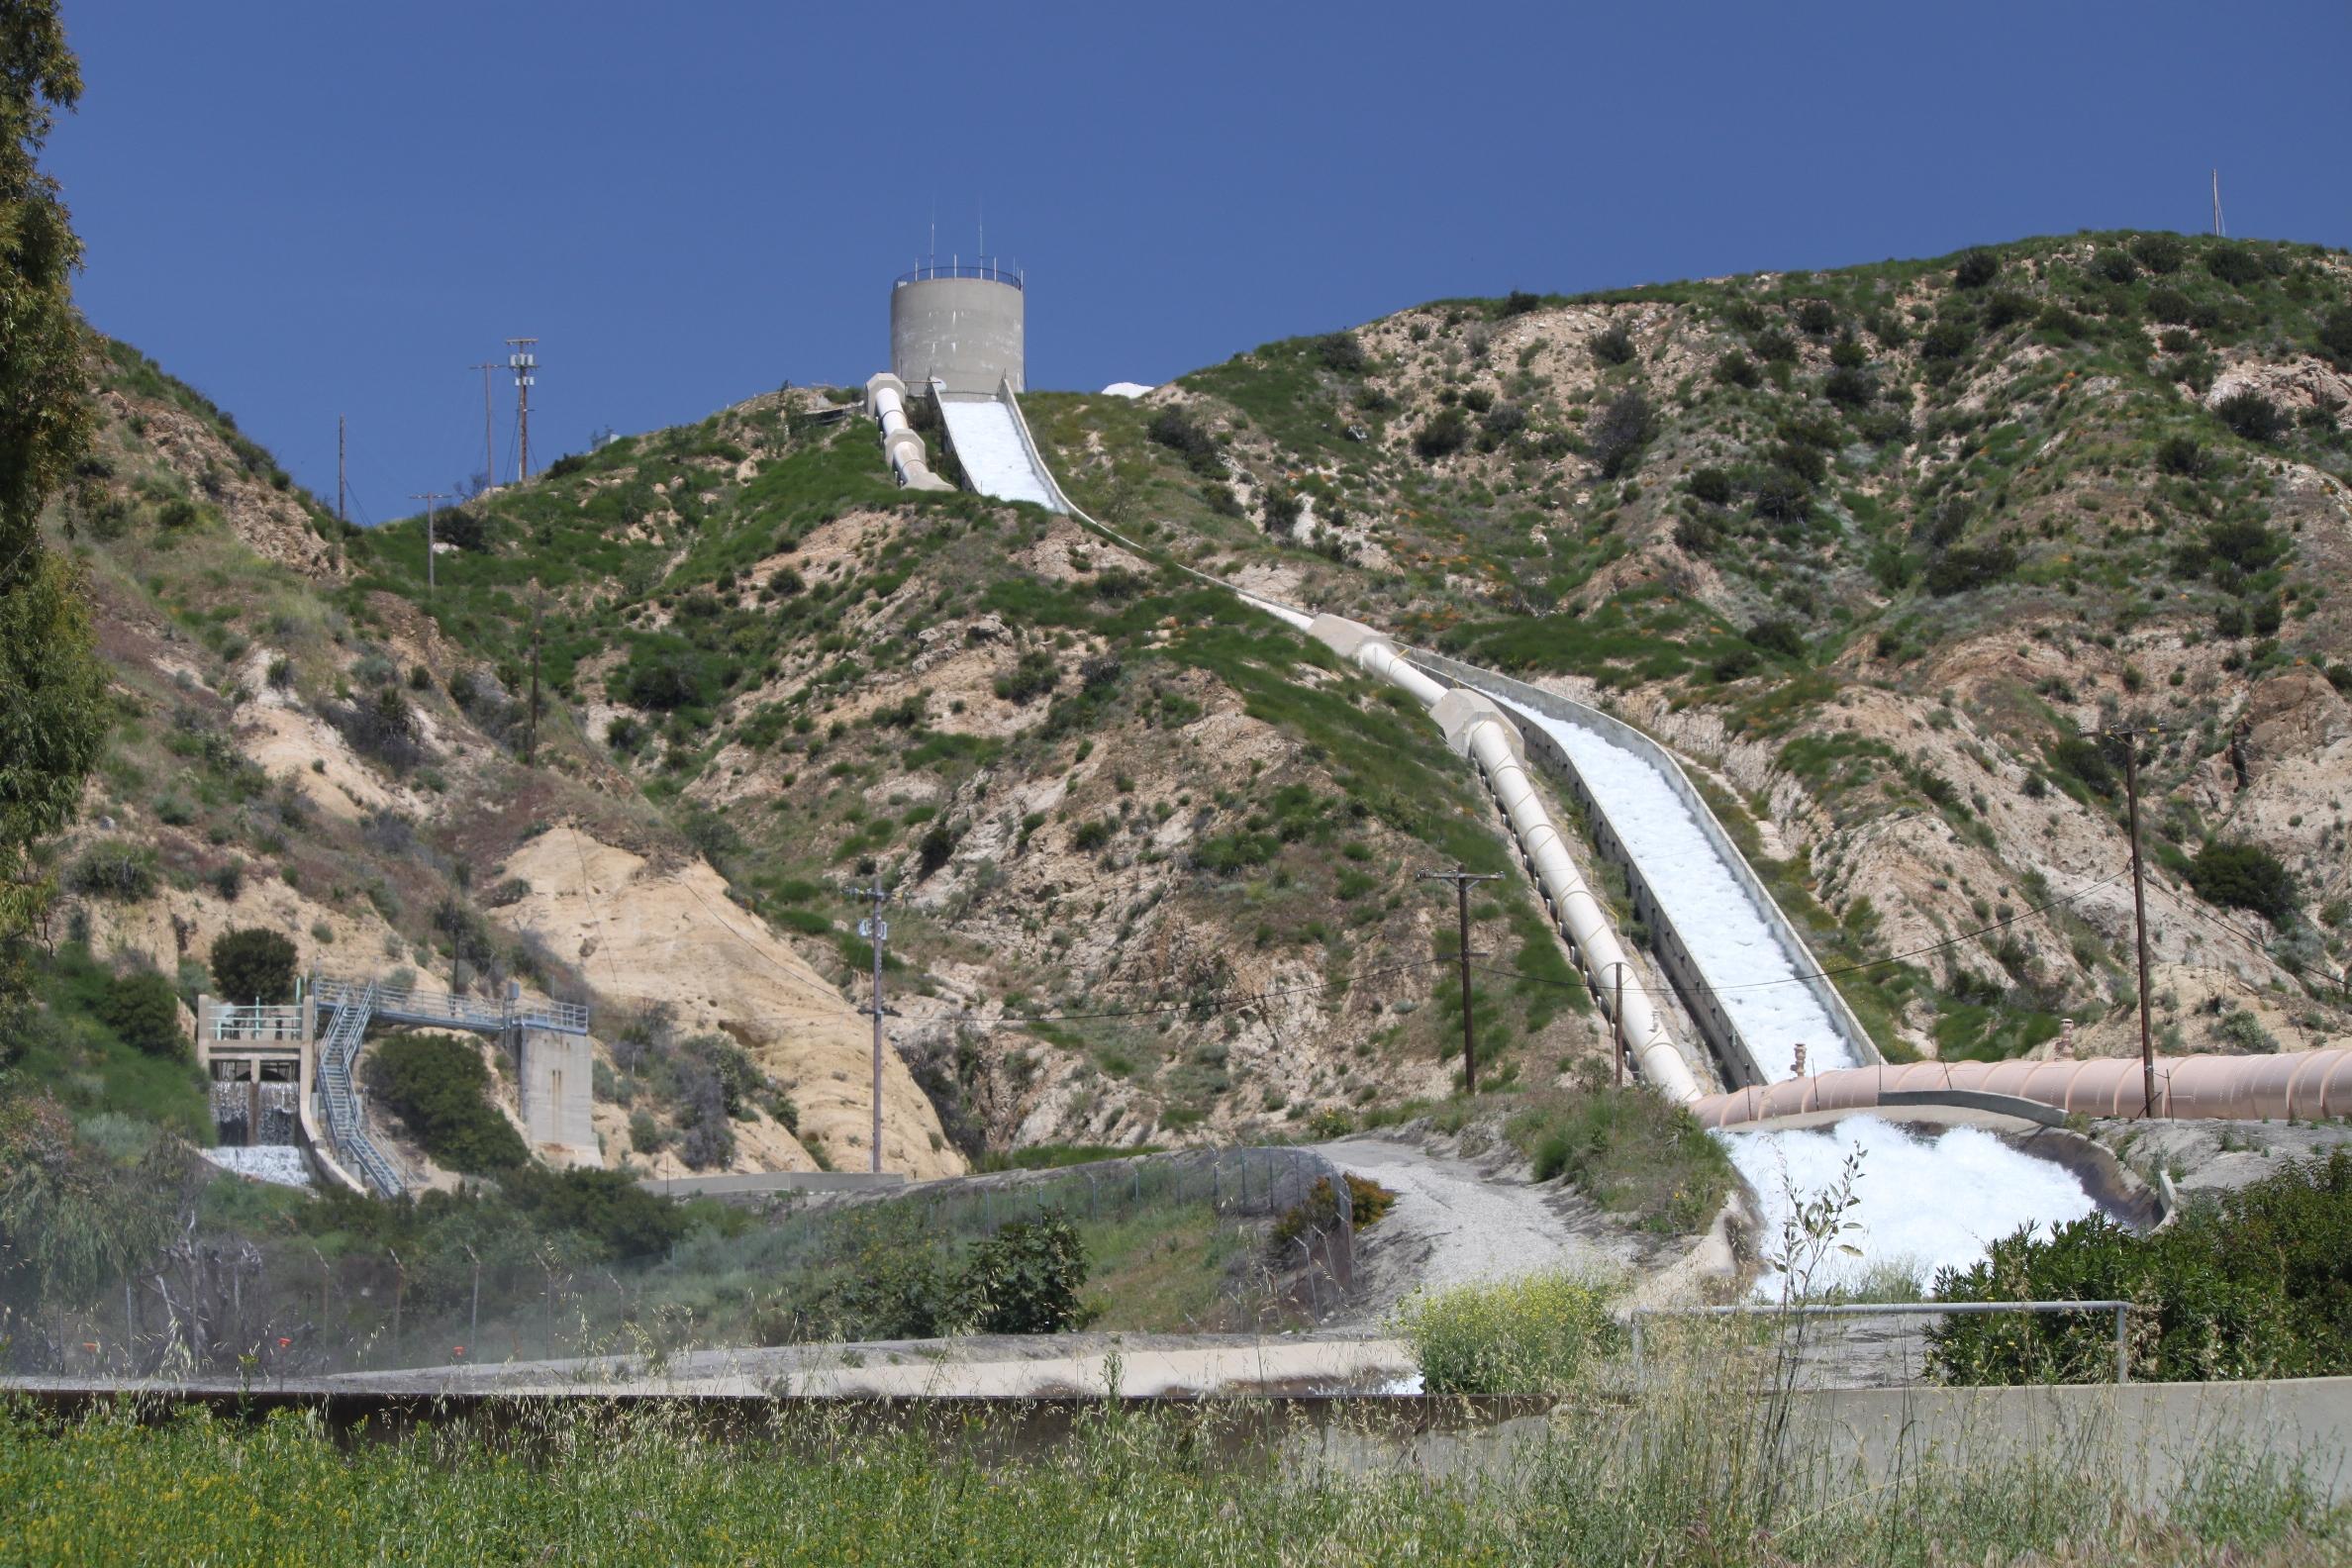 Los Angeles Aqueduct Cascades Facility | Maven's Photoblog